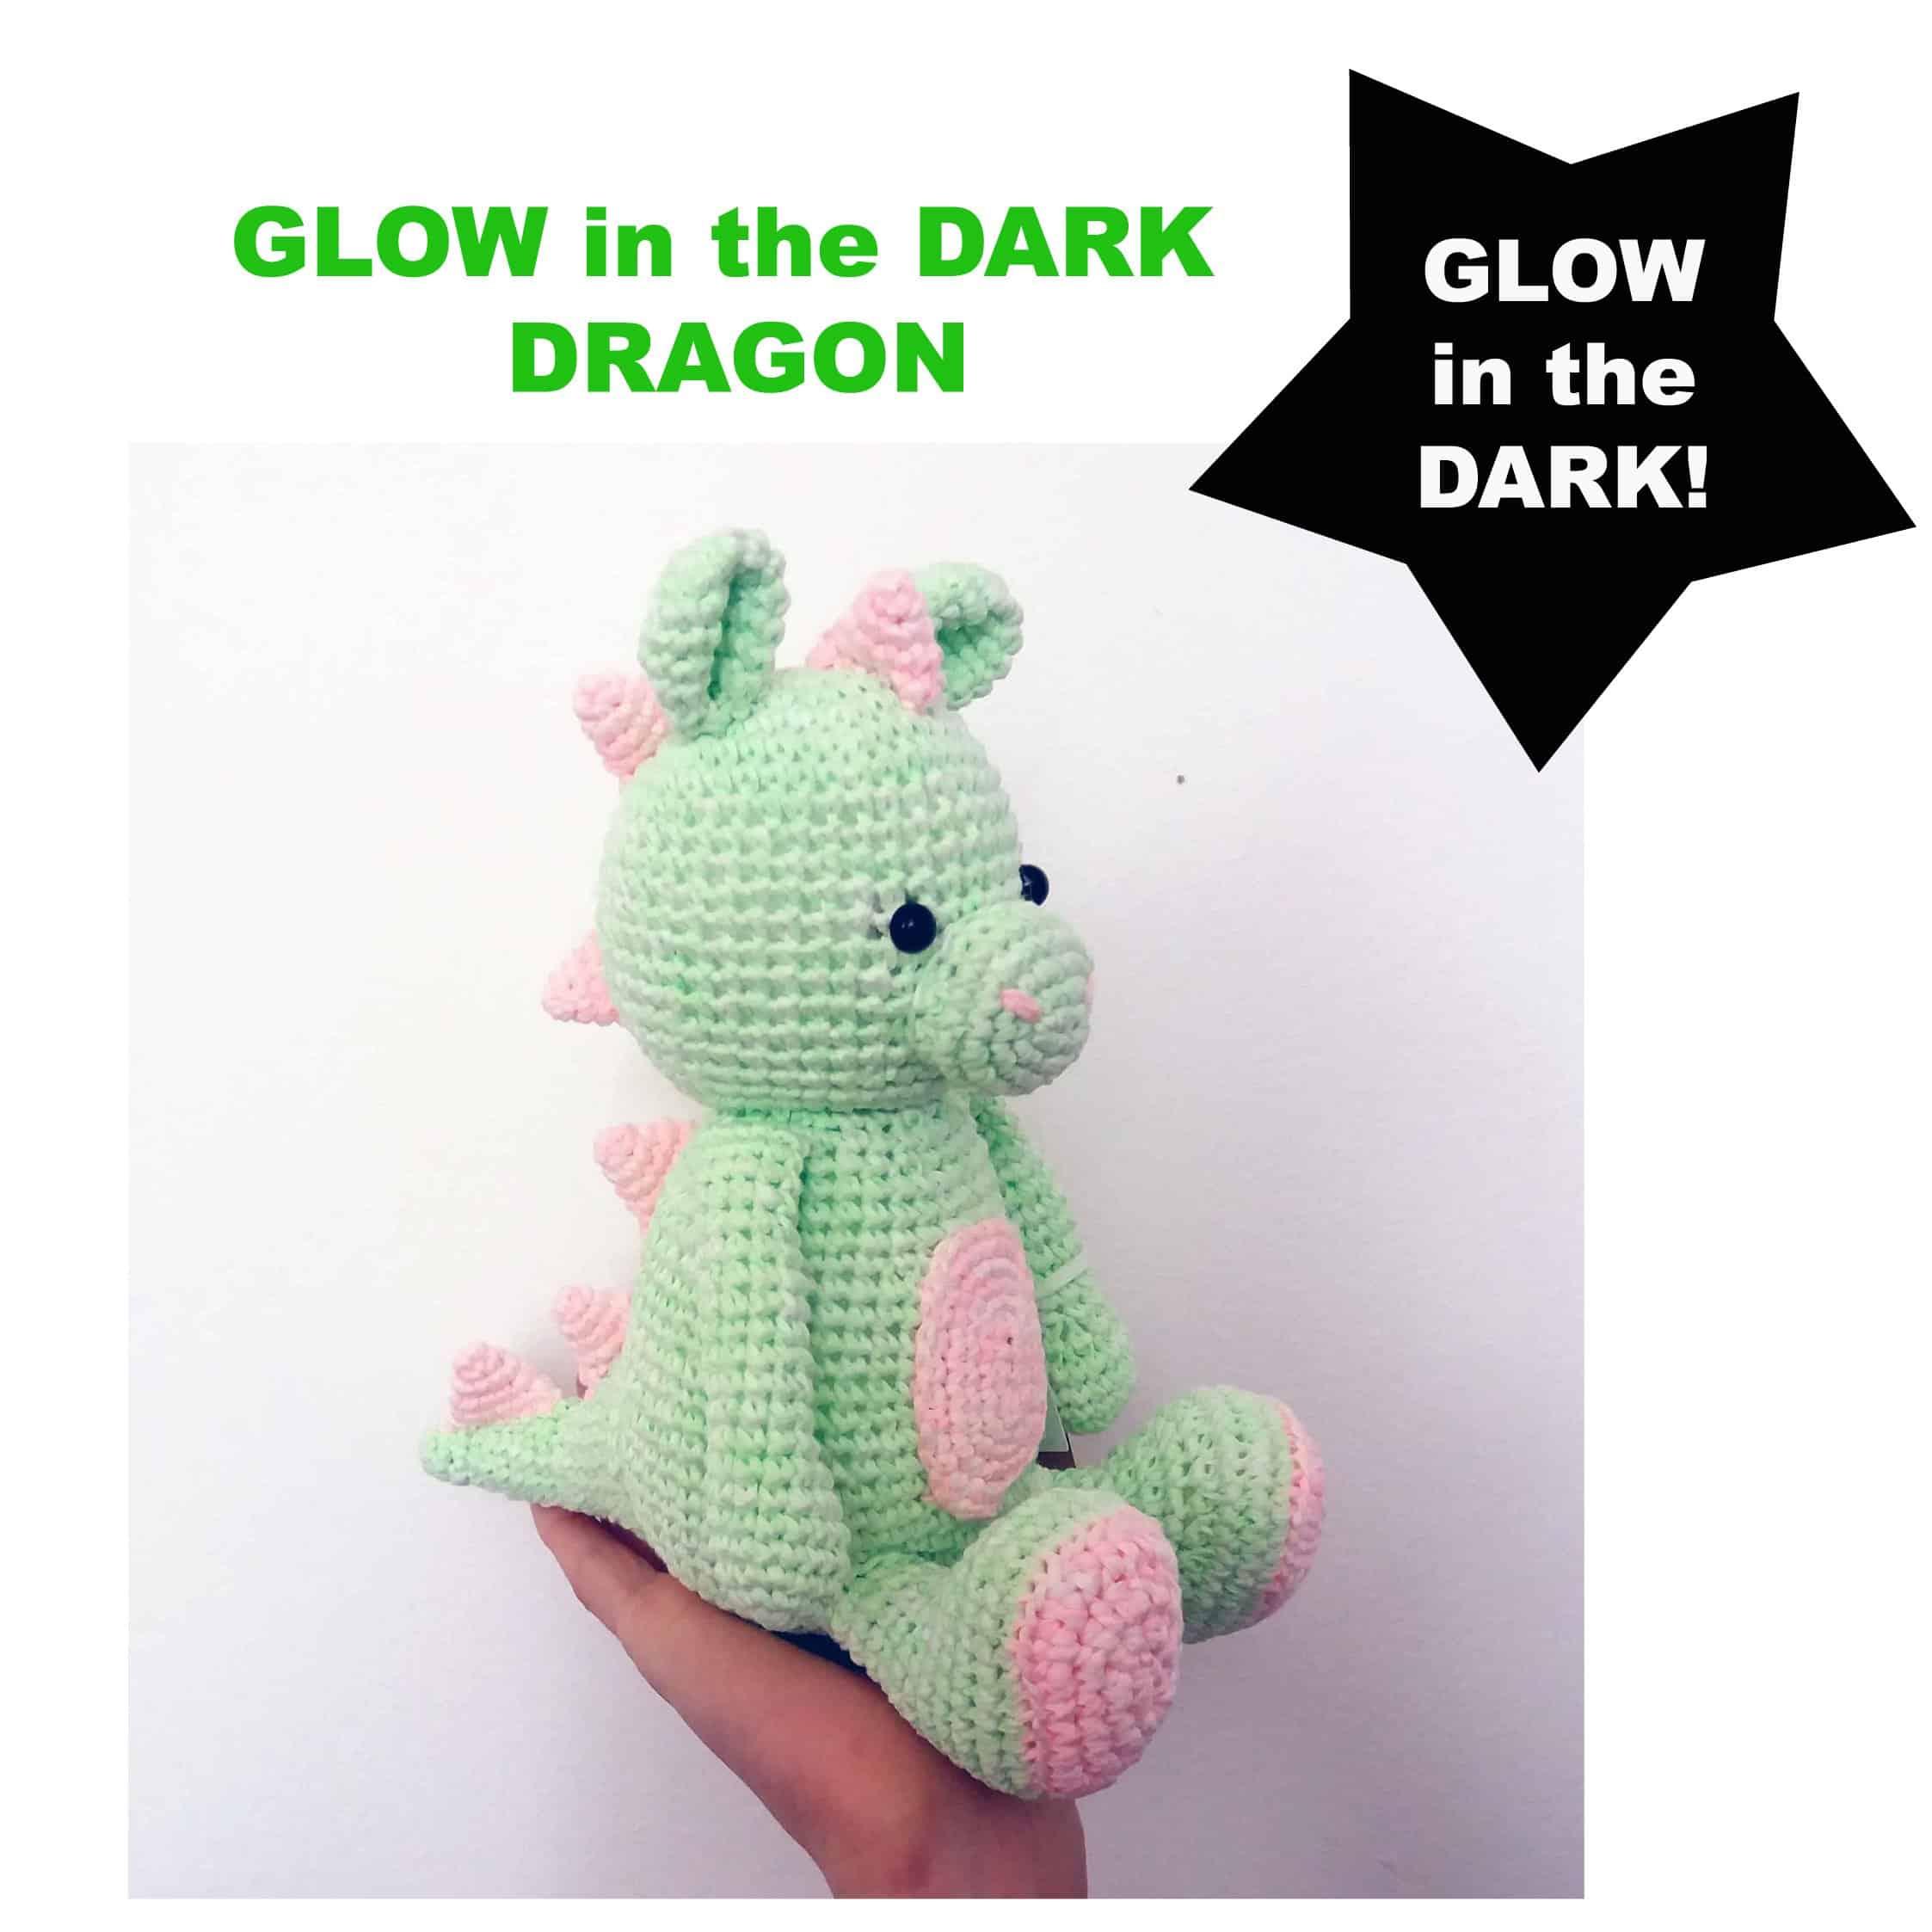 The Glow-in-the-dark Dragon